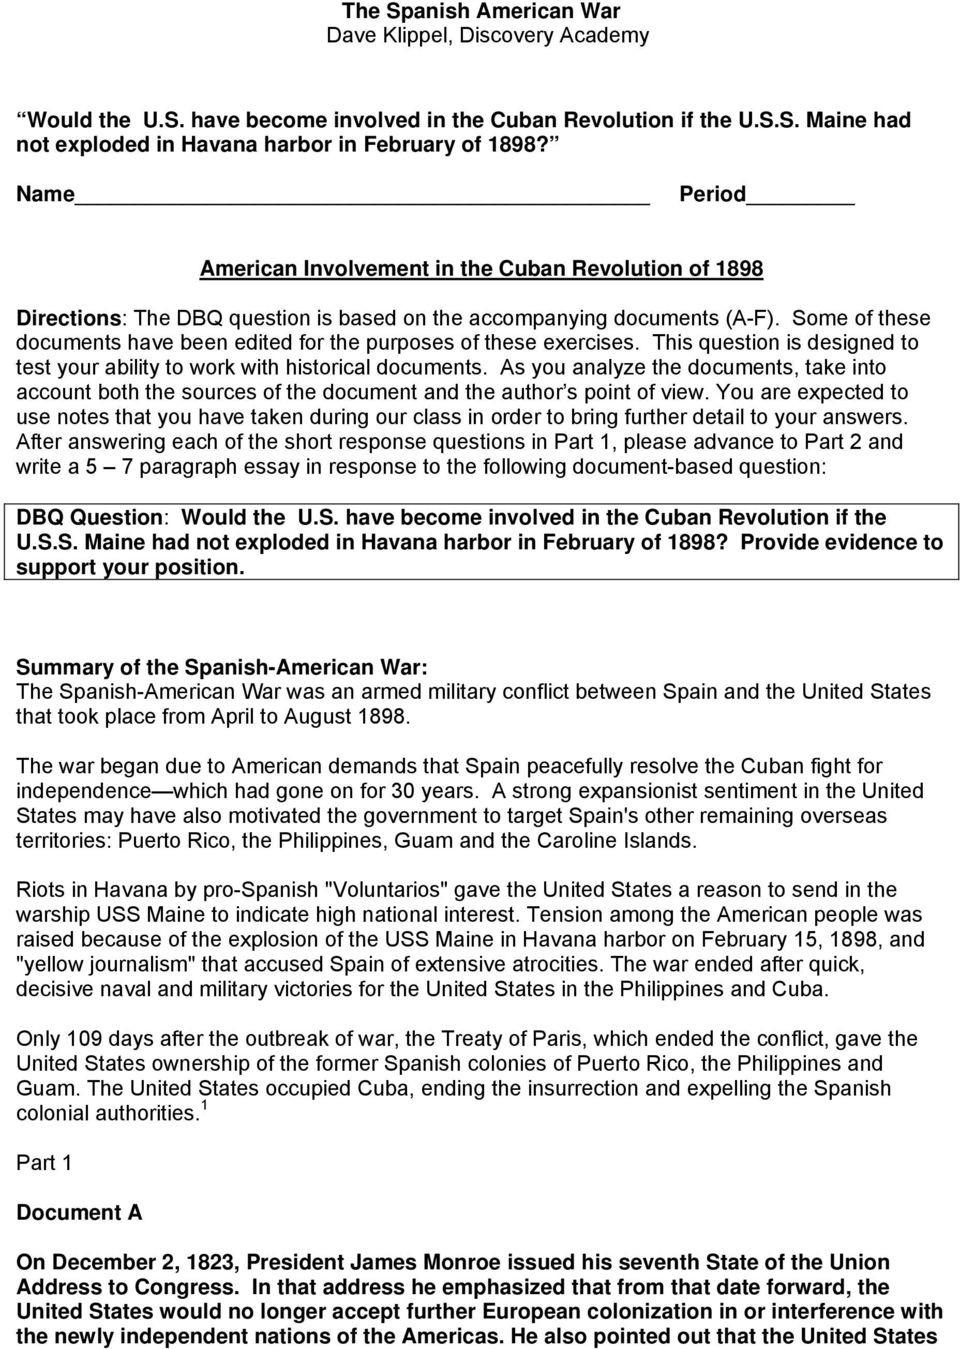 Spanish American War Worksheet the Spanish American War Dave Klippel Discovery Academy